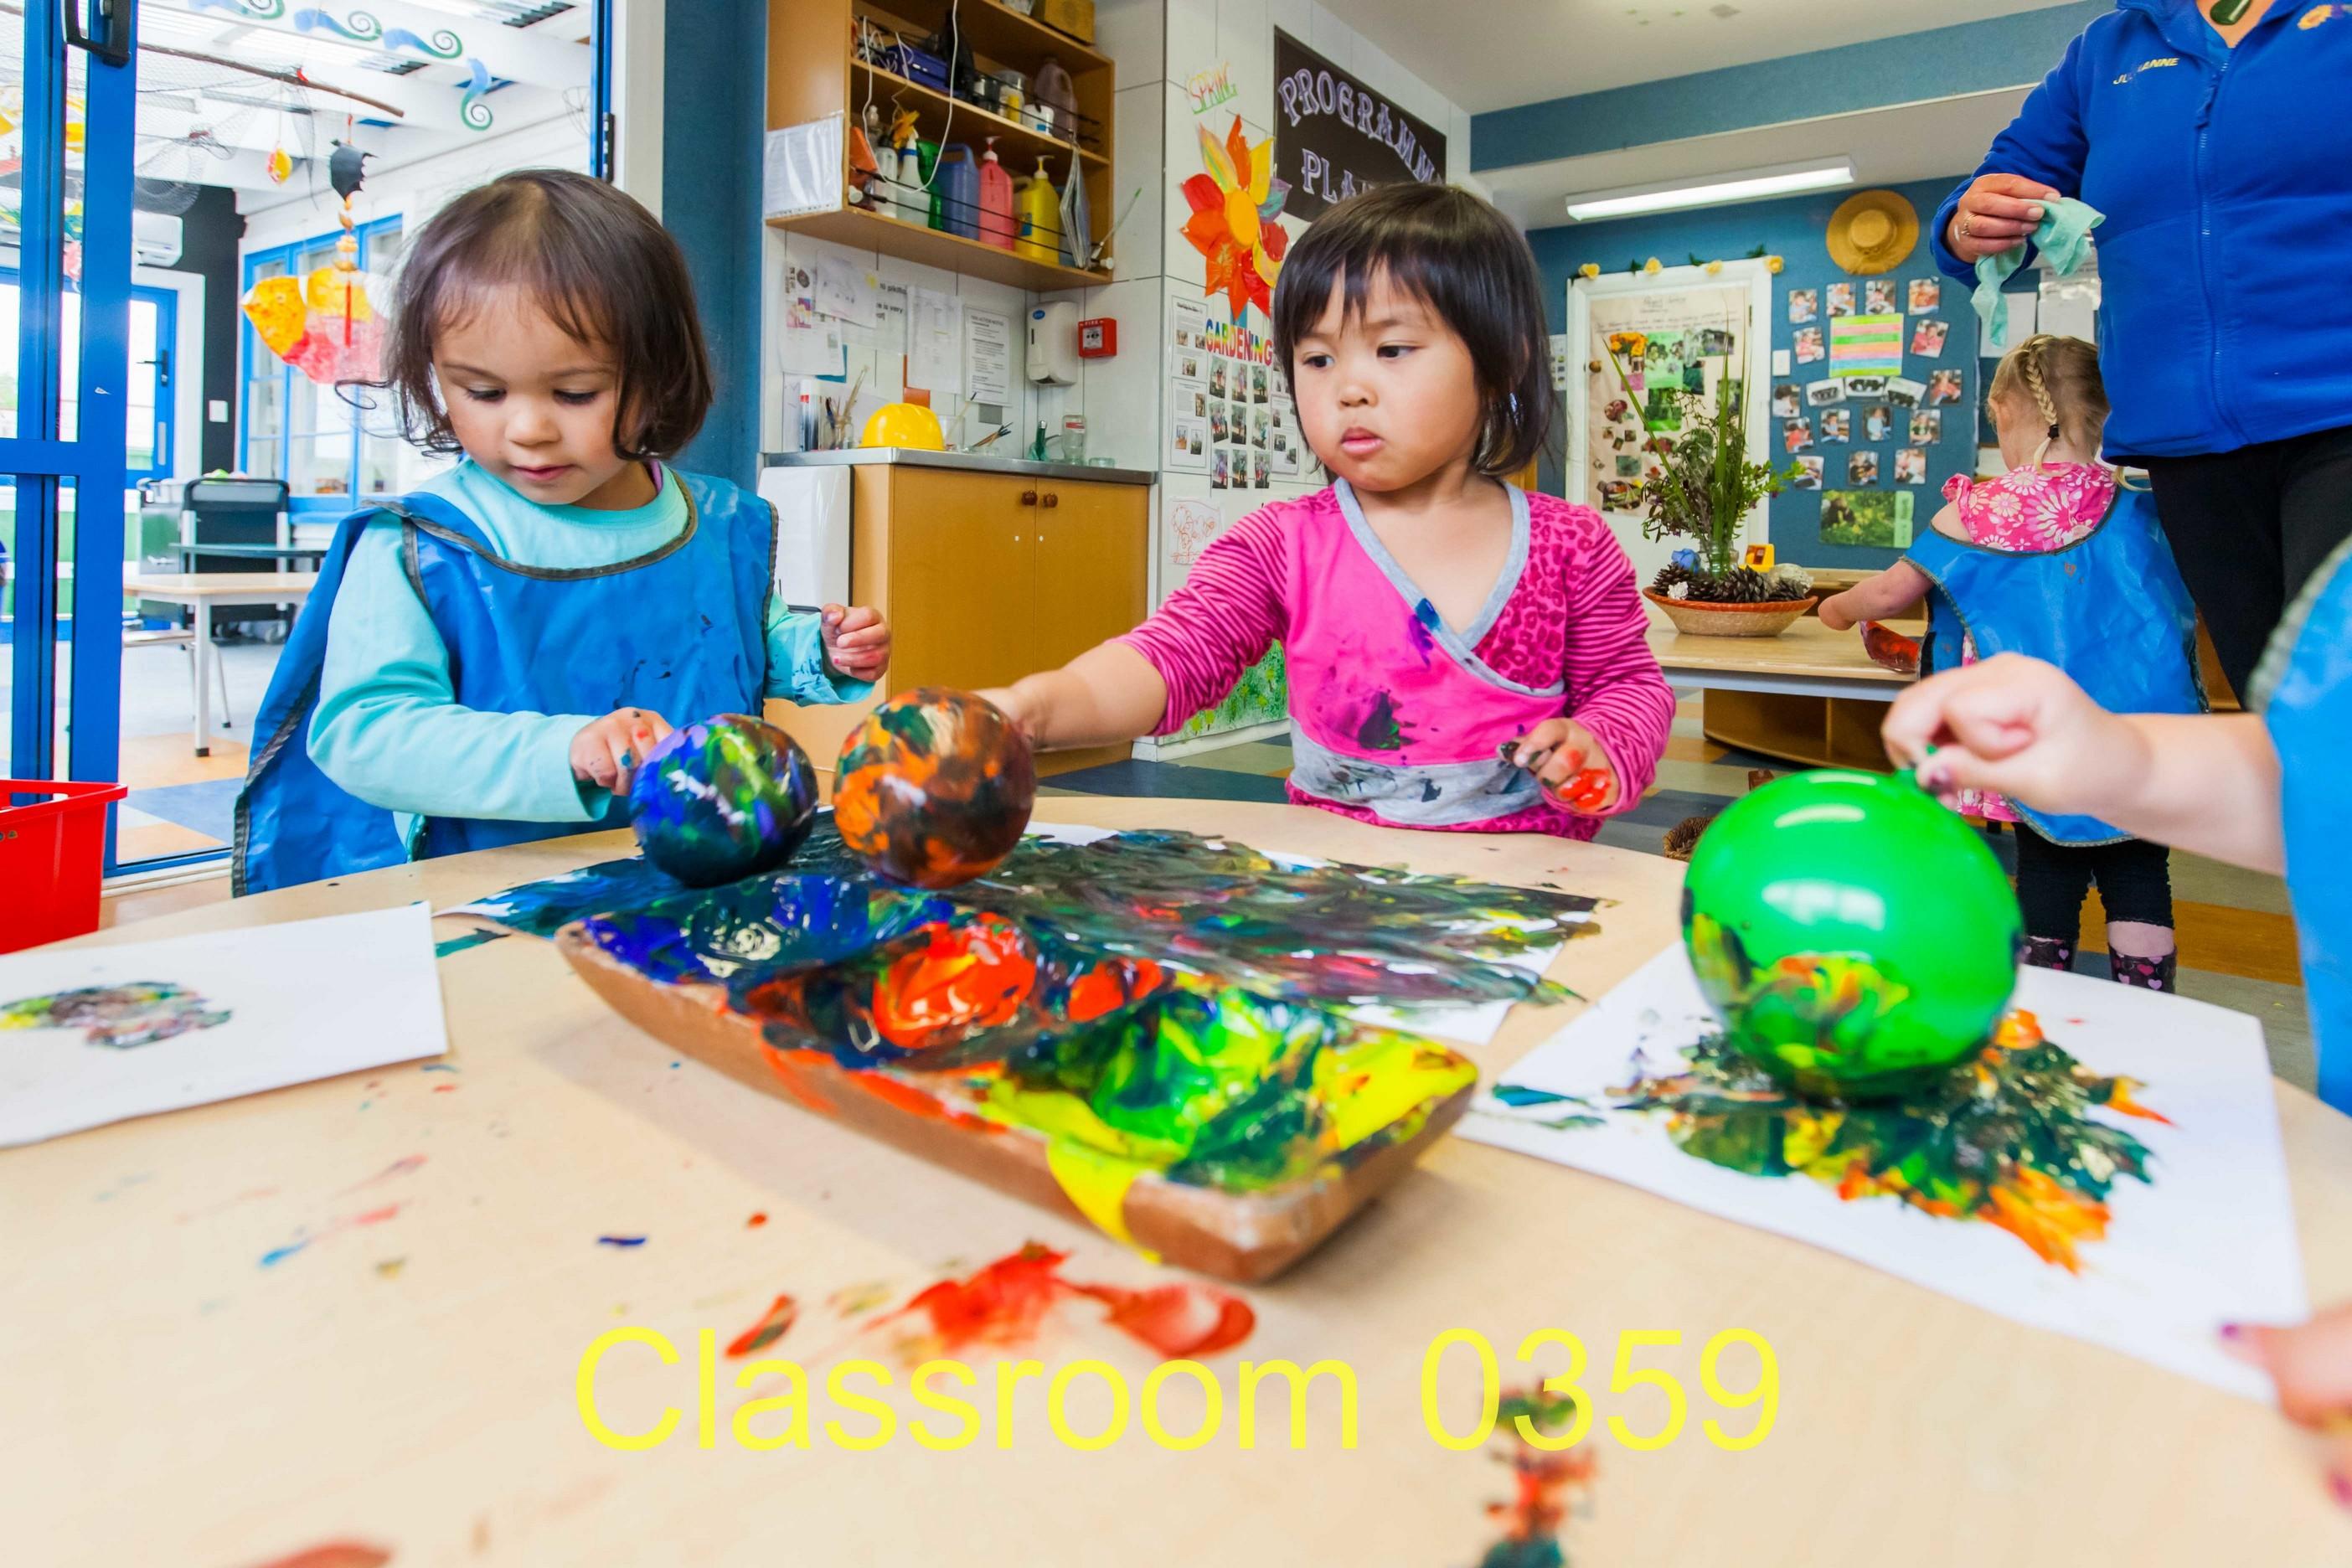 Classroom 0359